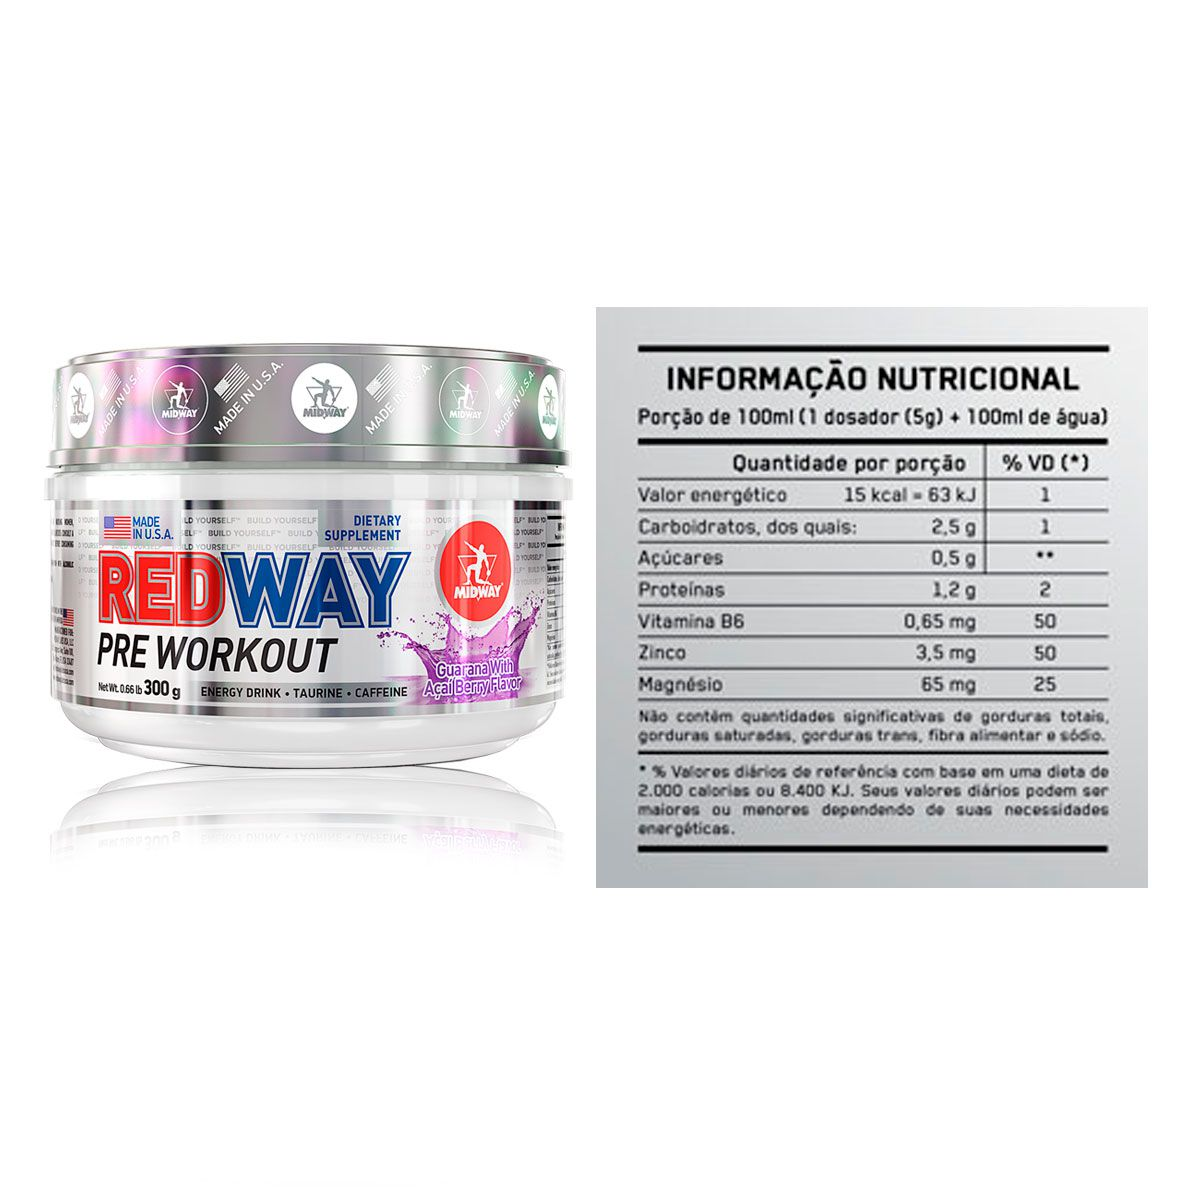 Kit Hipercalórico 7500 + Pré Treino Redway + Brindes - Midway